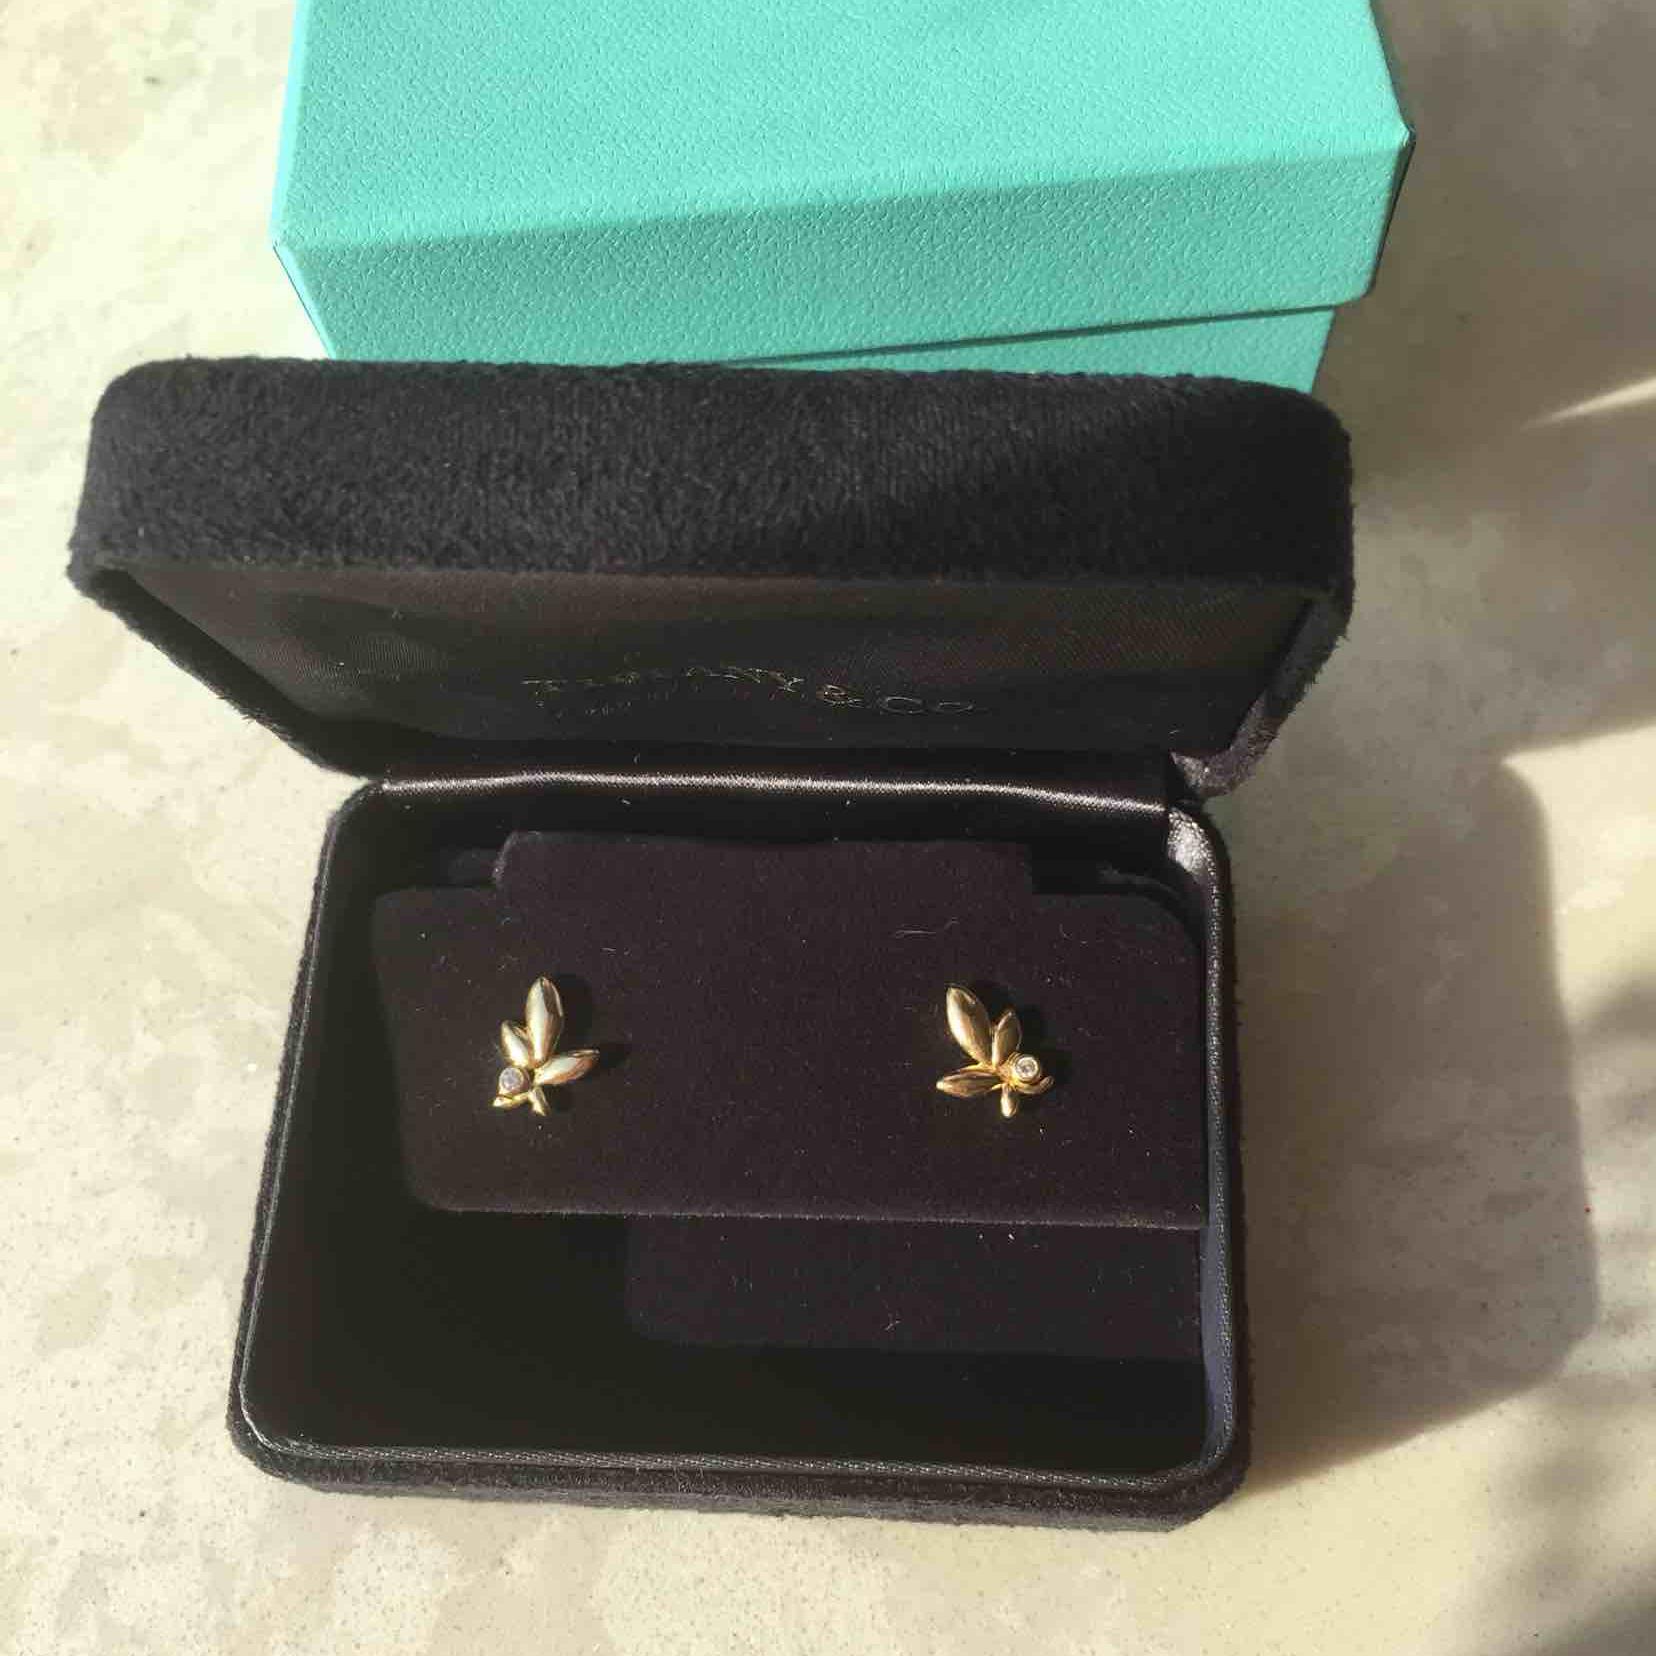 Tiffany蒂芙尼18k黄金镶钻耳钉